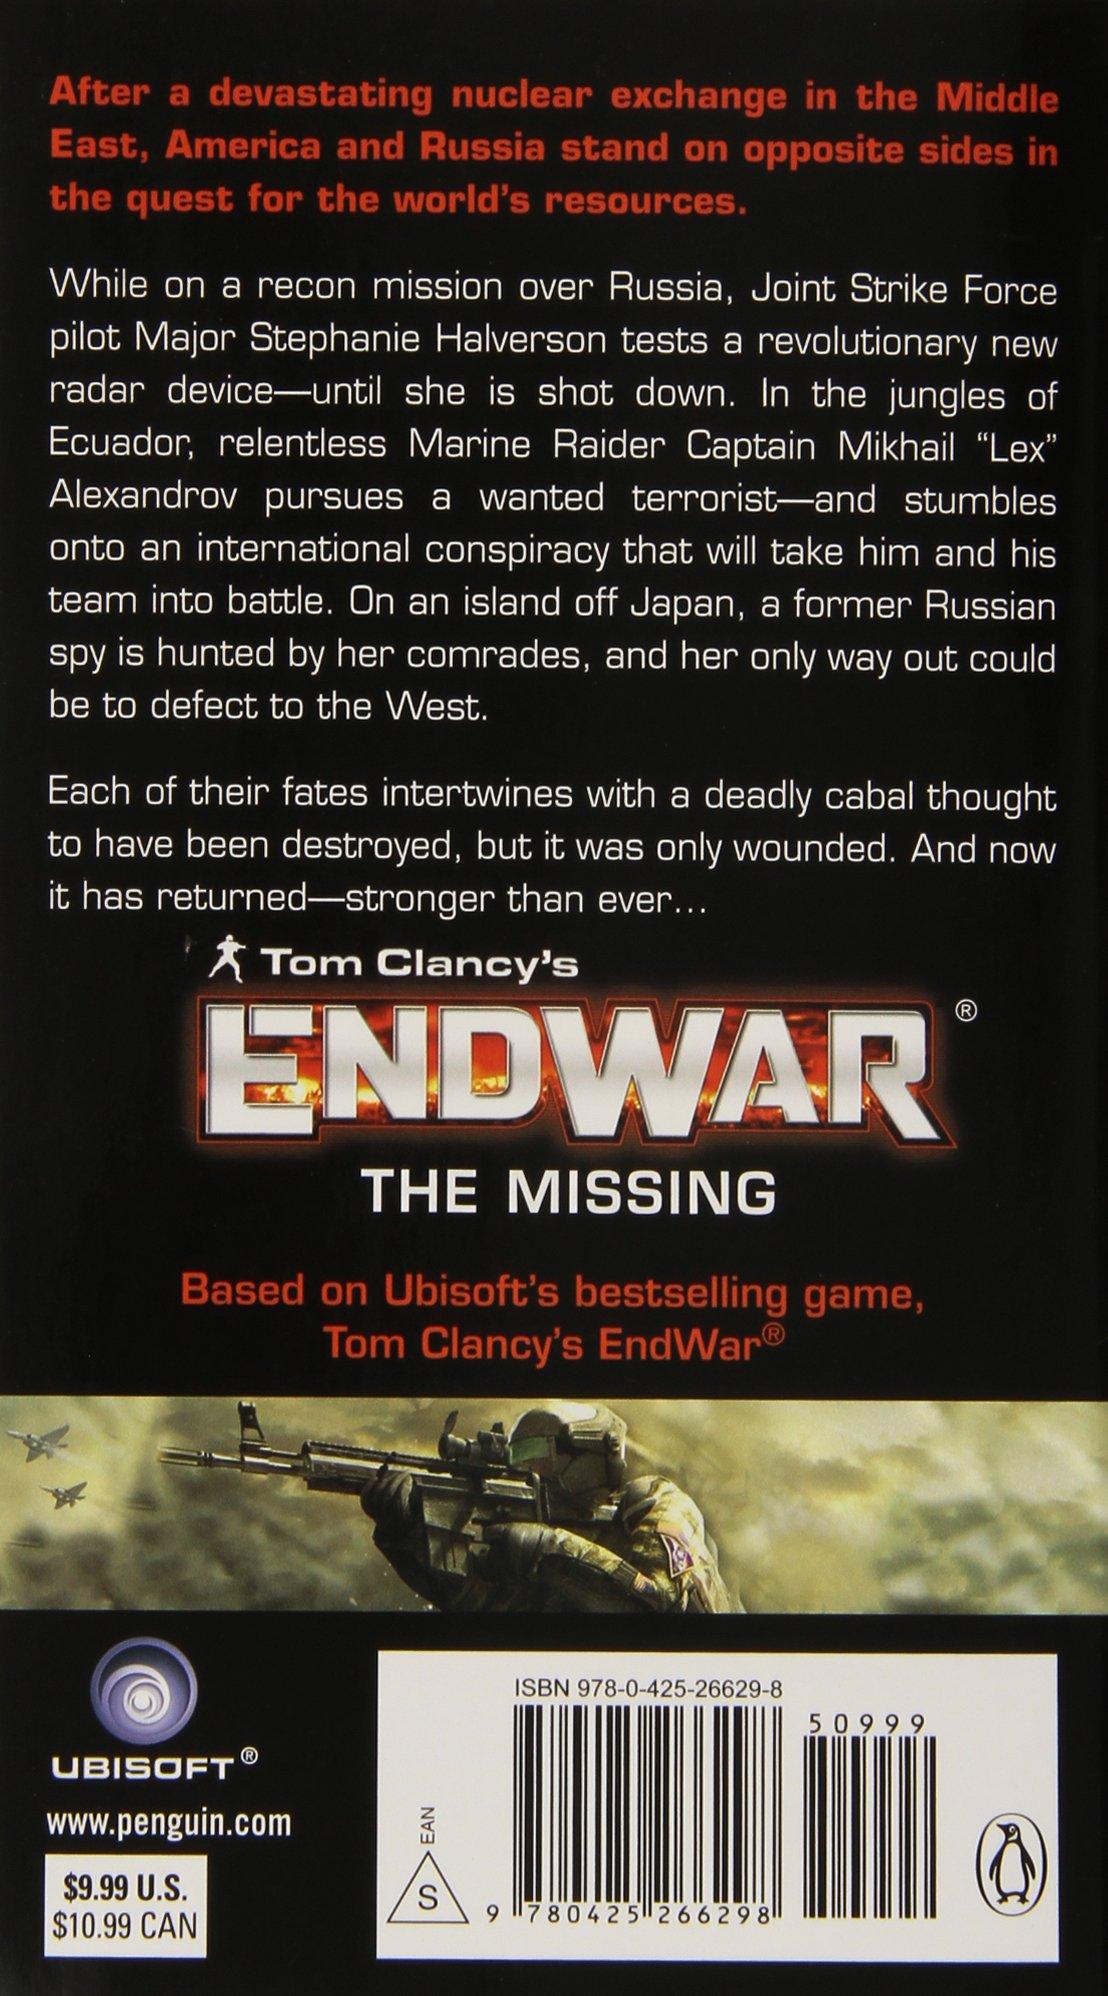 Hd wallpaper 3 tom clancy s endwar online - Amazon Com Tom Clancy S Endwar The Missing 9780425266298 Peter Telep Tom Clancy Books